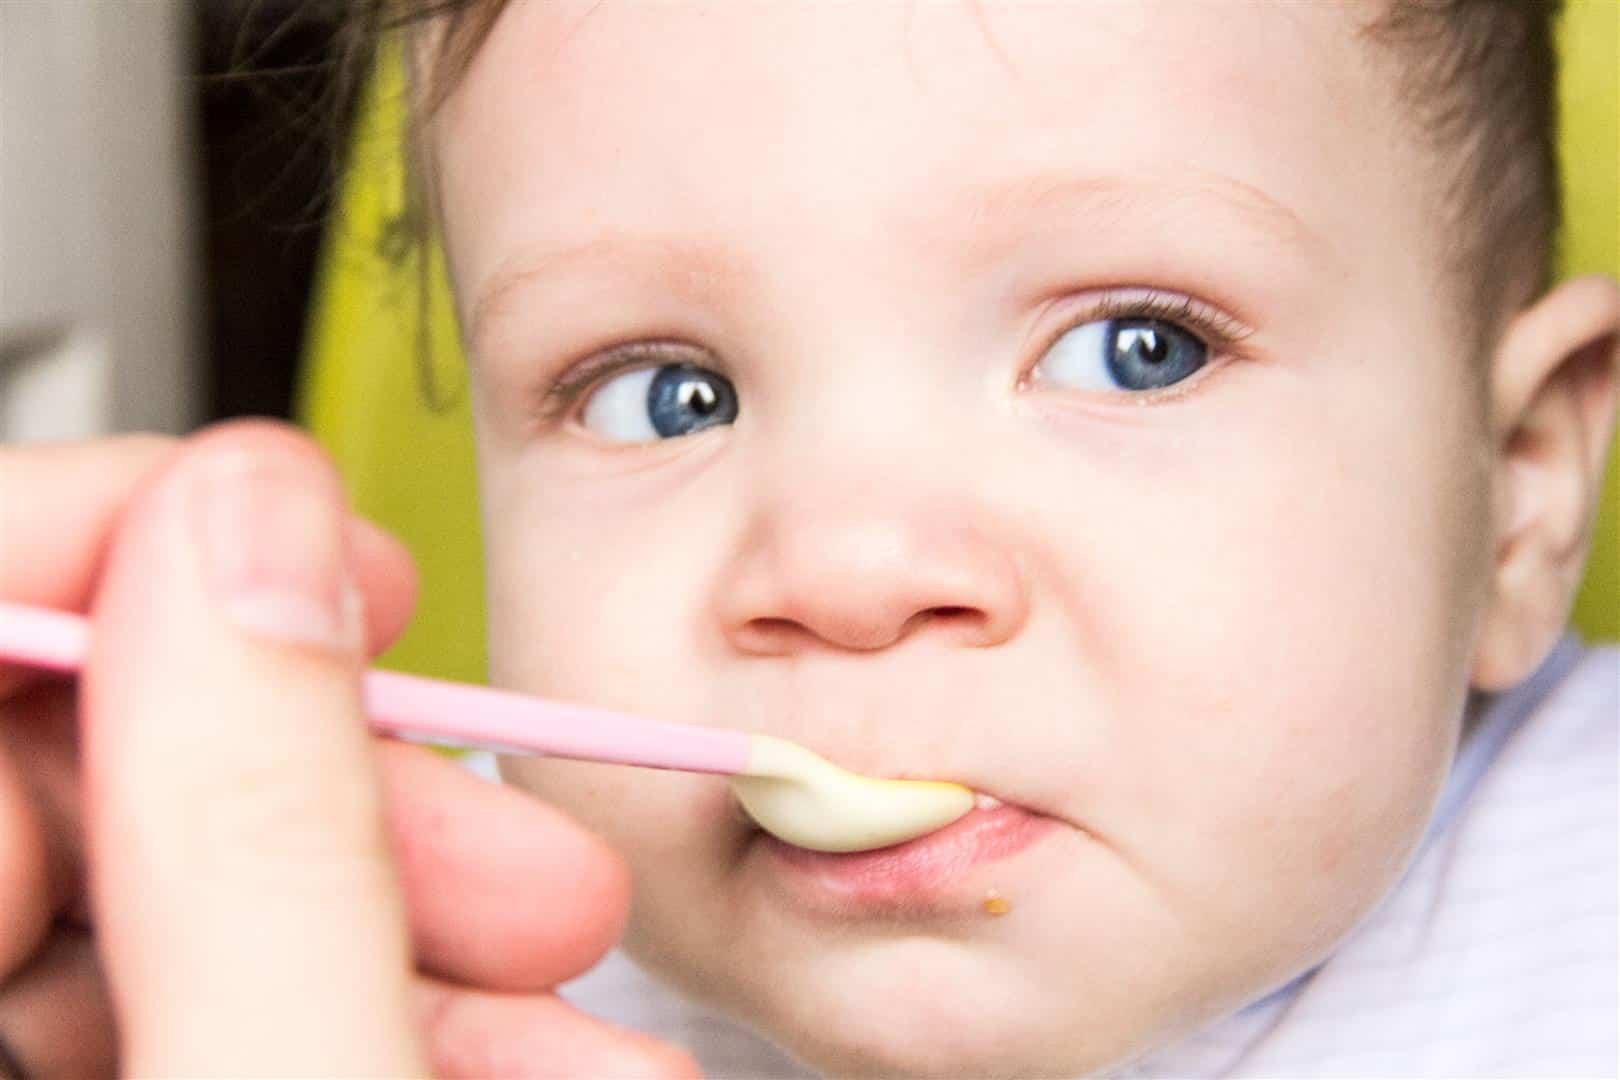 Baby Toddler Kidney Bean Puree Home Sweet Sweden